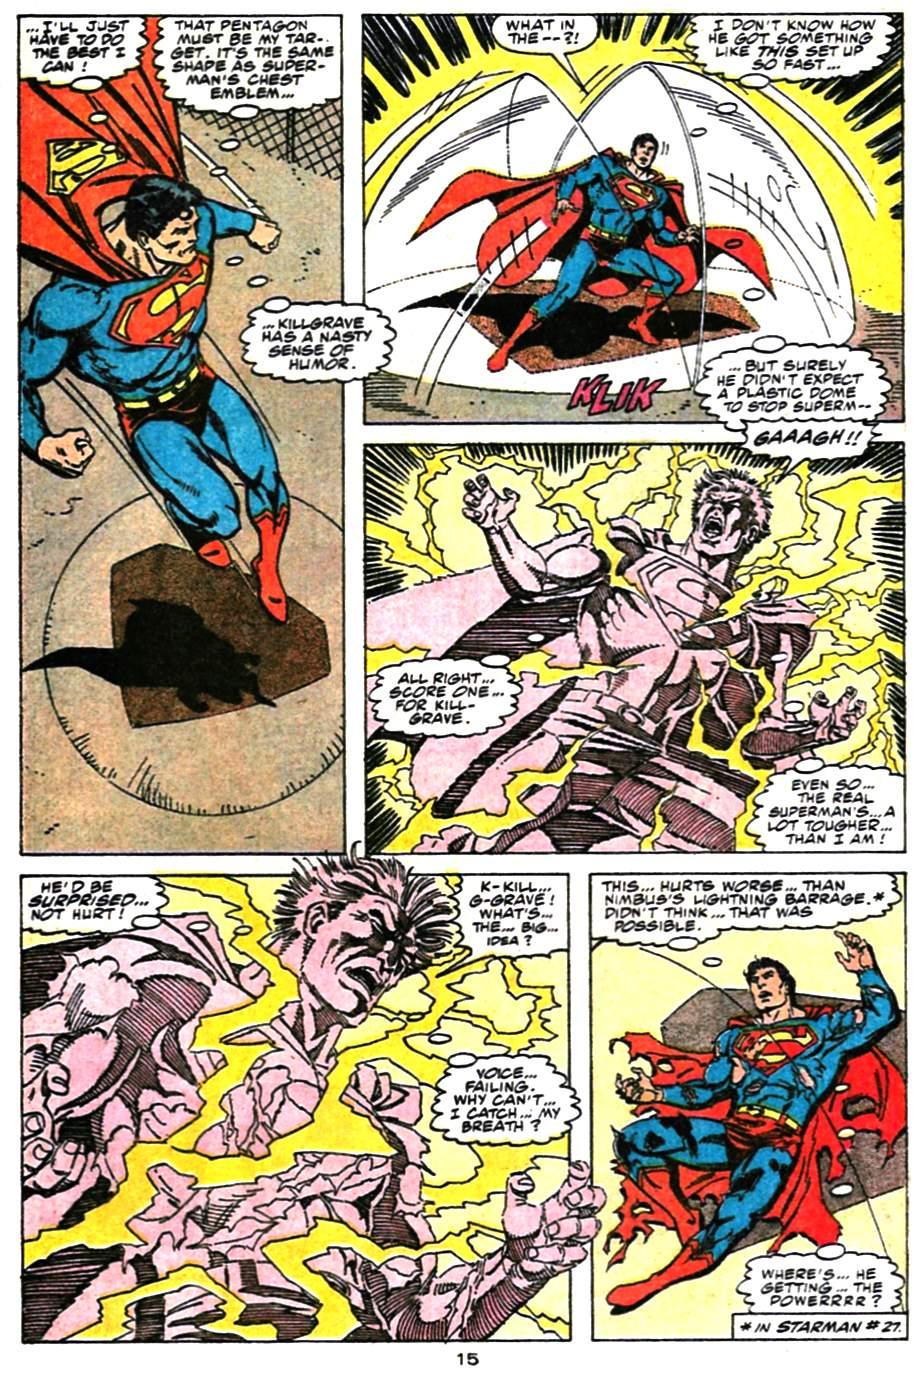 Action Comics (1938) 659 Page 15